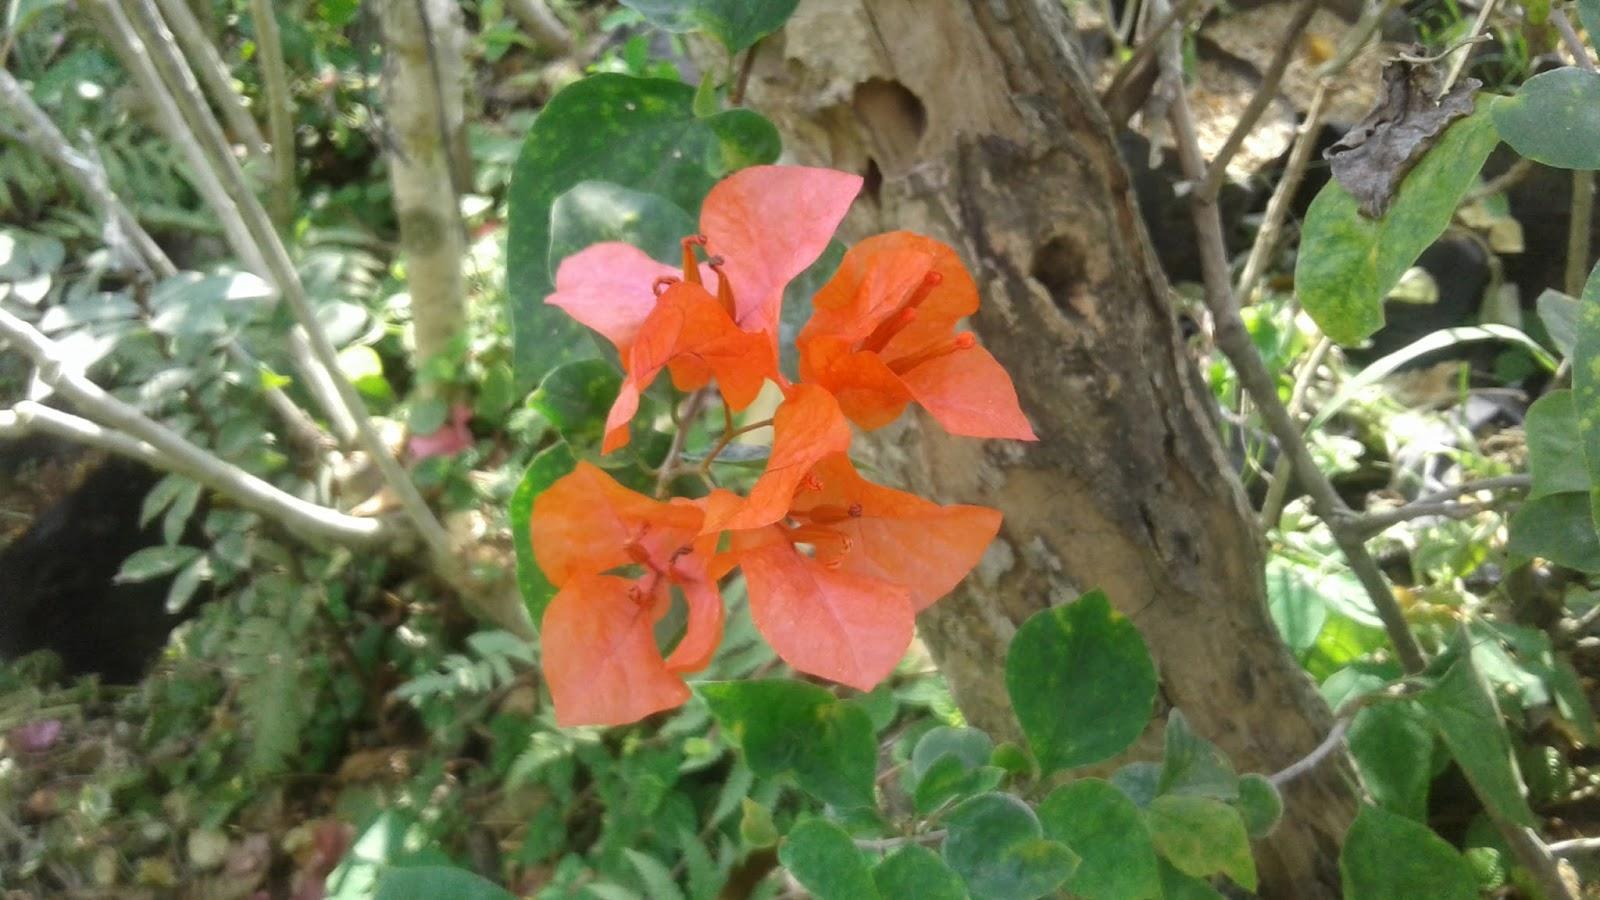 Foto Bunga Bougenville Atau Bunga Kertas Lima Warna